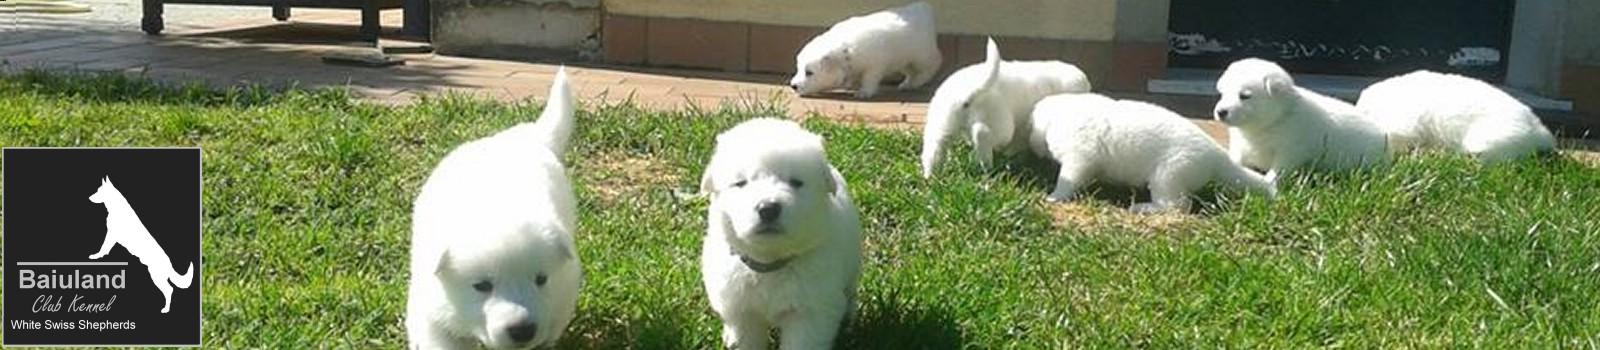 inbreeding in today's pet dog - BAIULAND Club Kennel